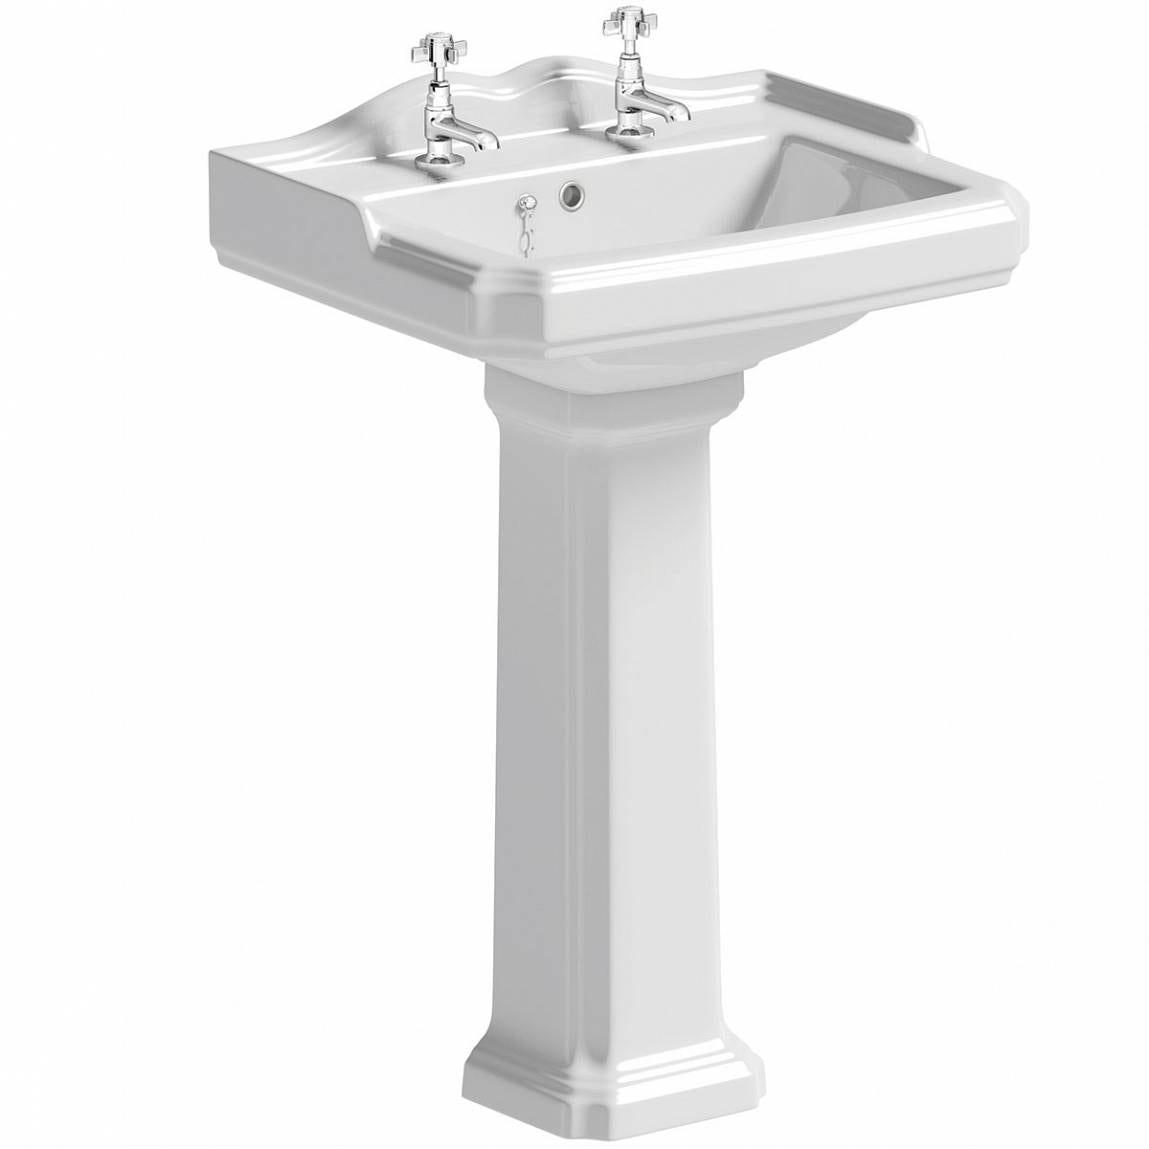 Winchester 2 tap hole full pedestal basin 600mm